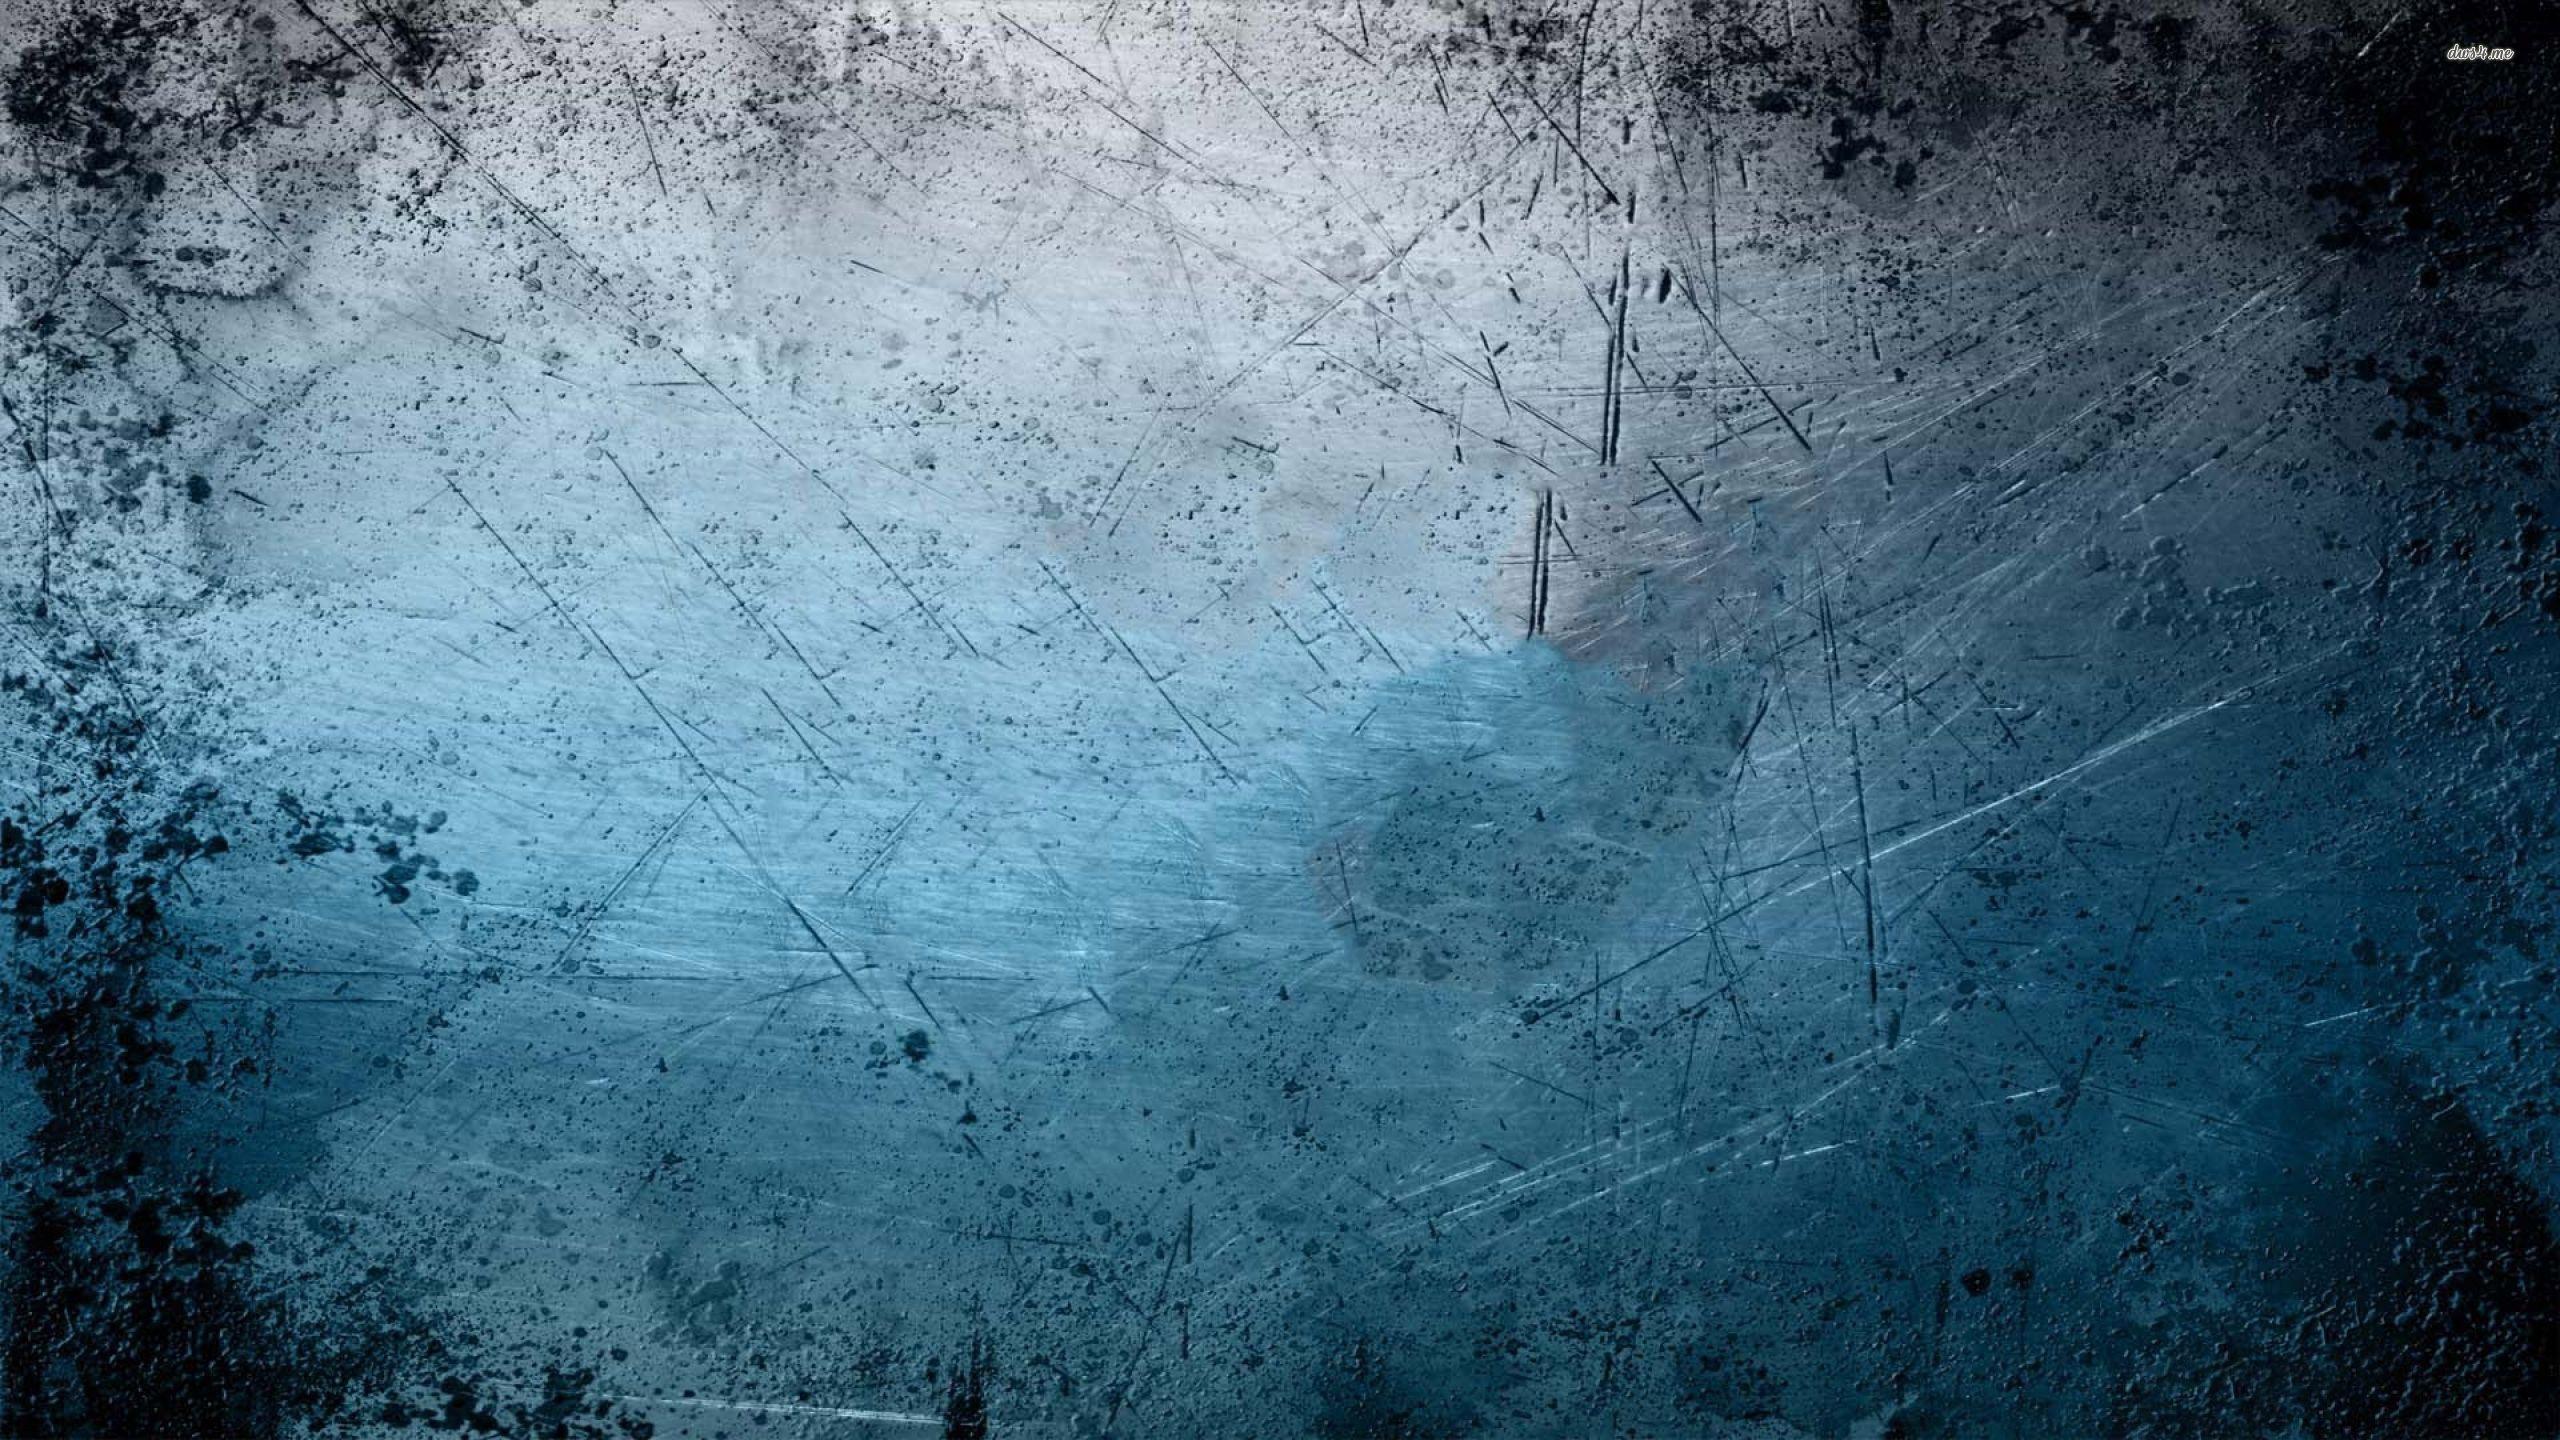 Blue Scratched Texture Hd Wallpaper Textured Wallpaper Abstract Wallpaper Elements Of Art Texture